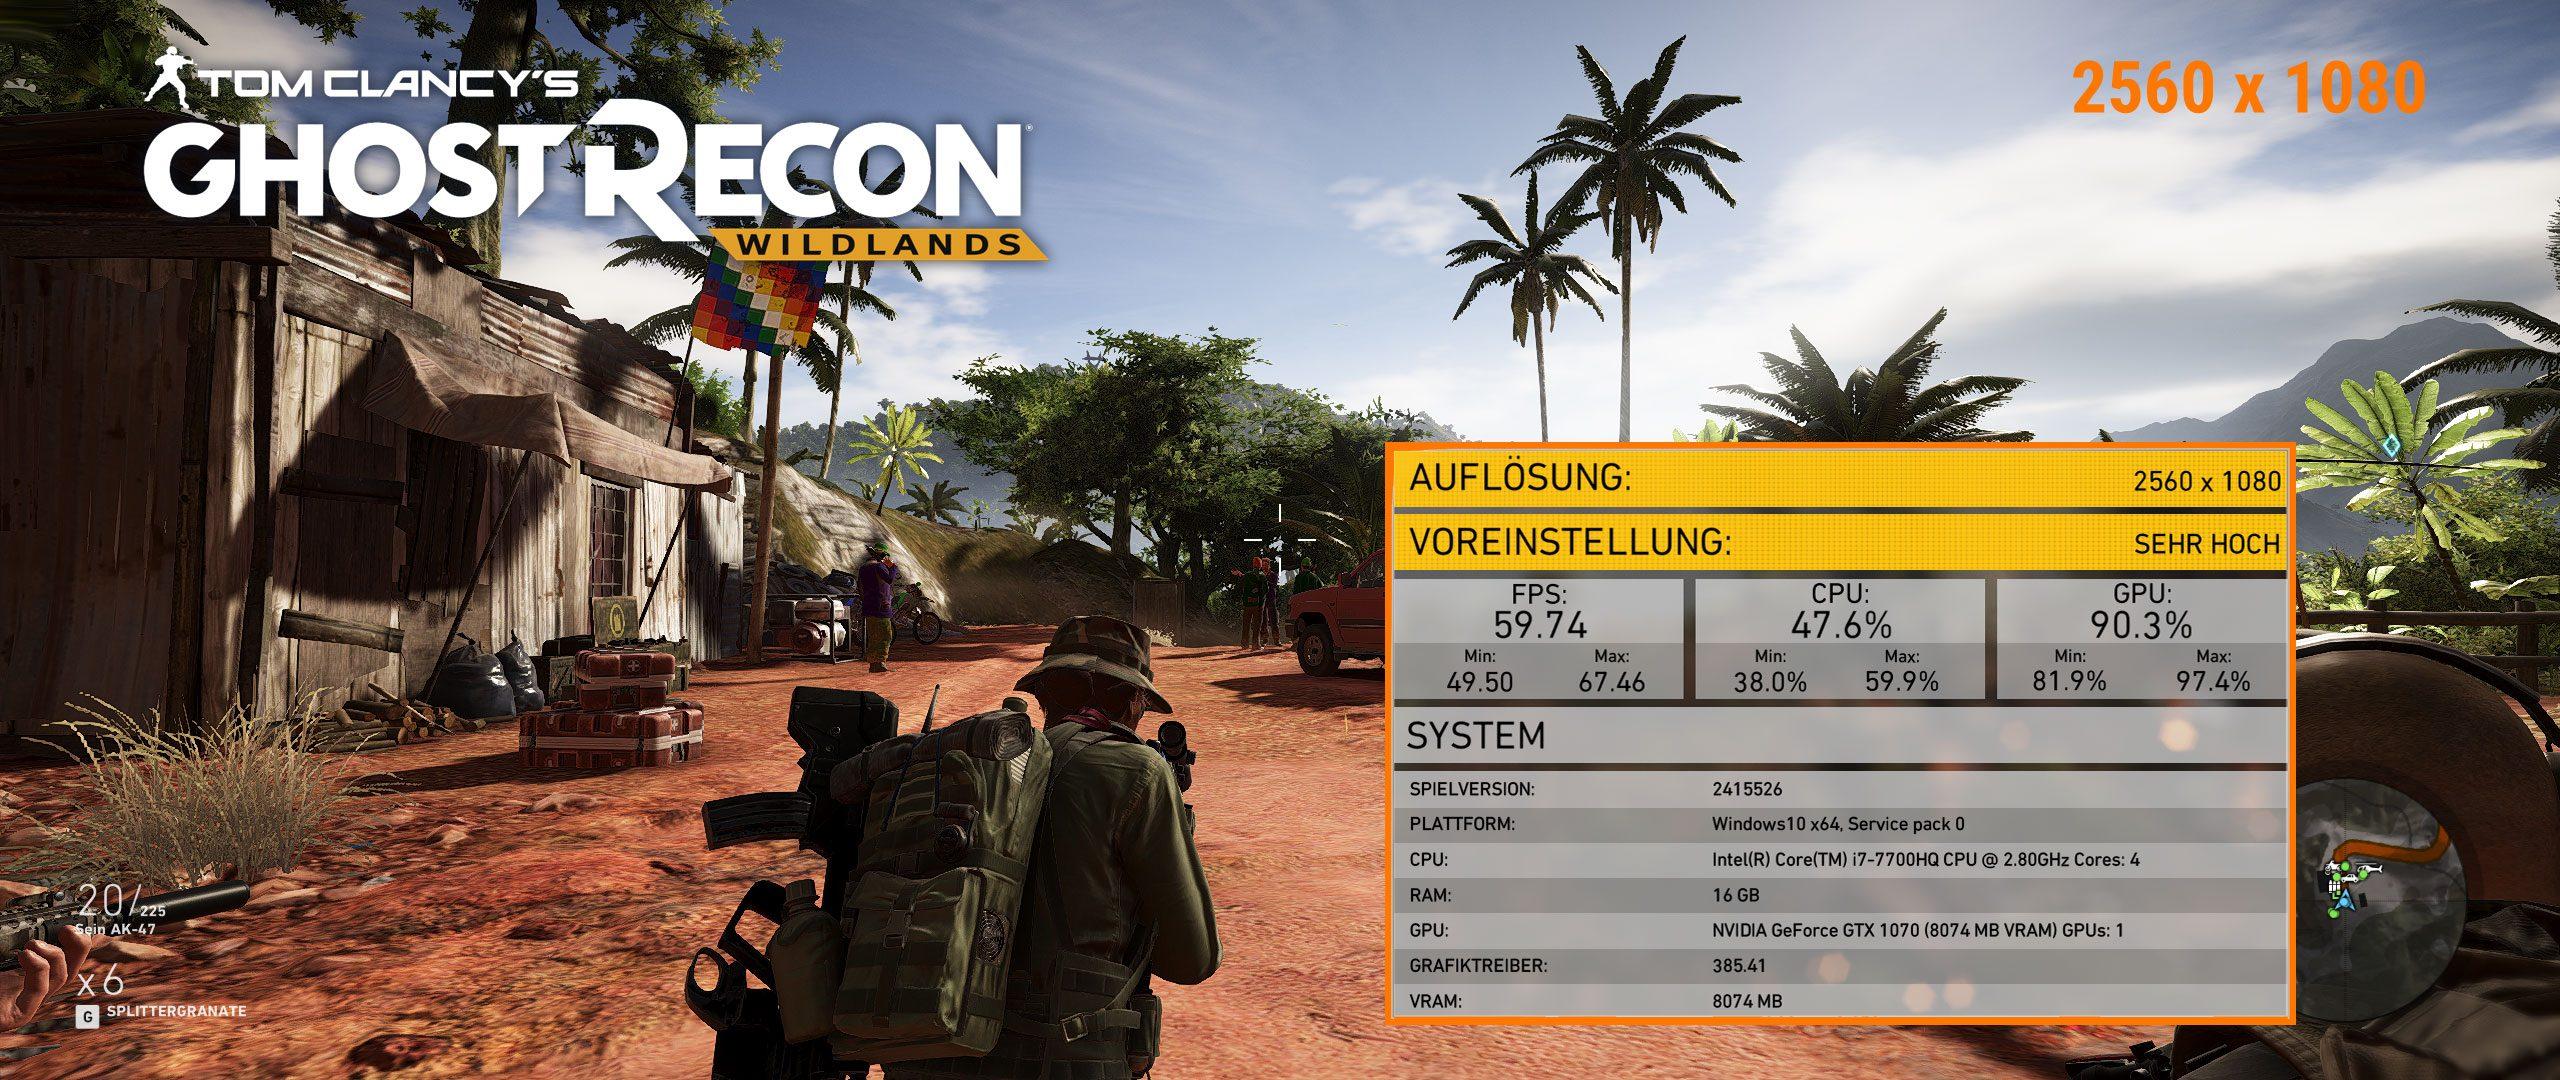 Acer-Predator-17-G9-793-718-Games-Monitor-4